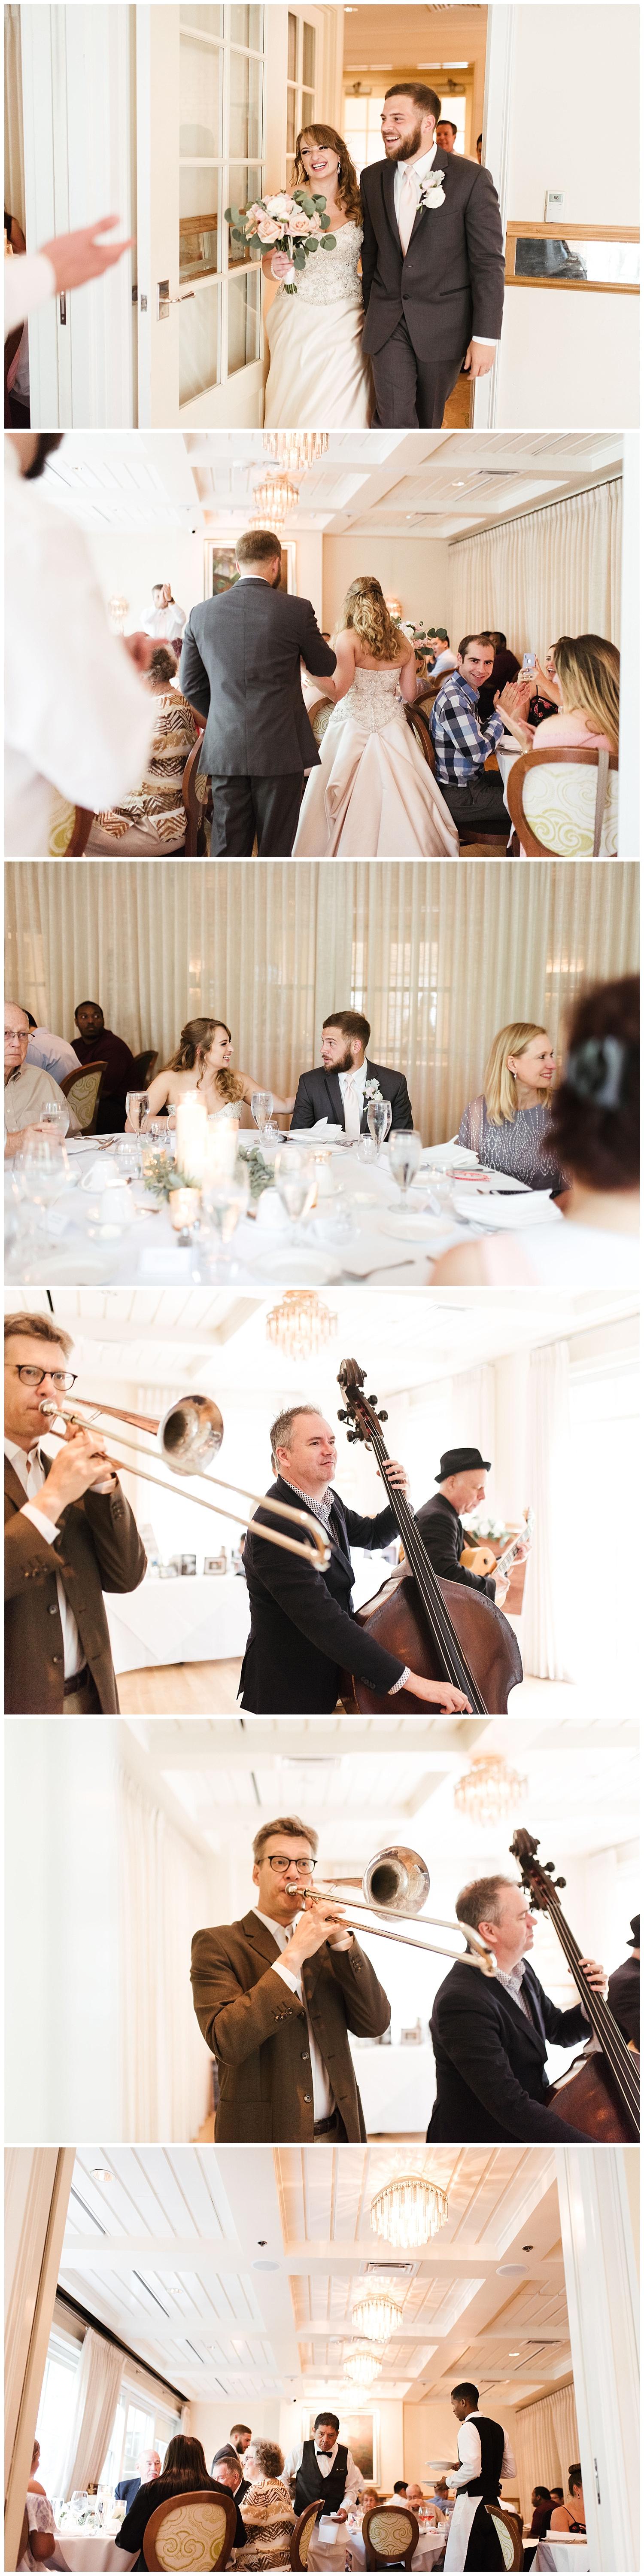 Houston Wedding, Brennan's of Houston wedding | Fort Worth Wedding Photographer | Dallas Wedding Photographer | www.jordanmitchellphotography.com